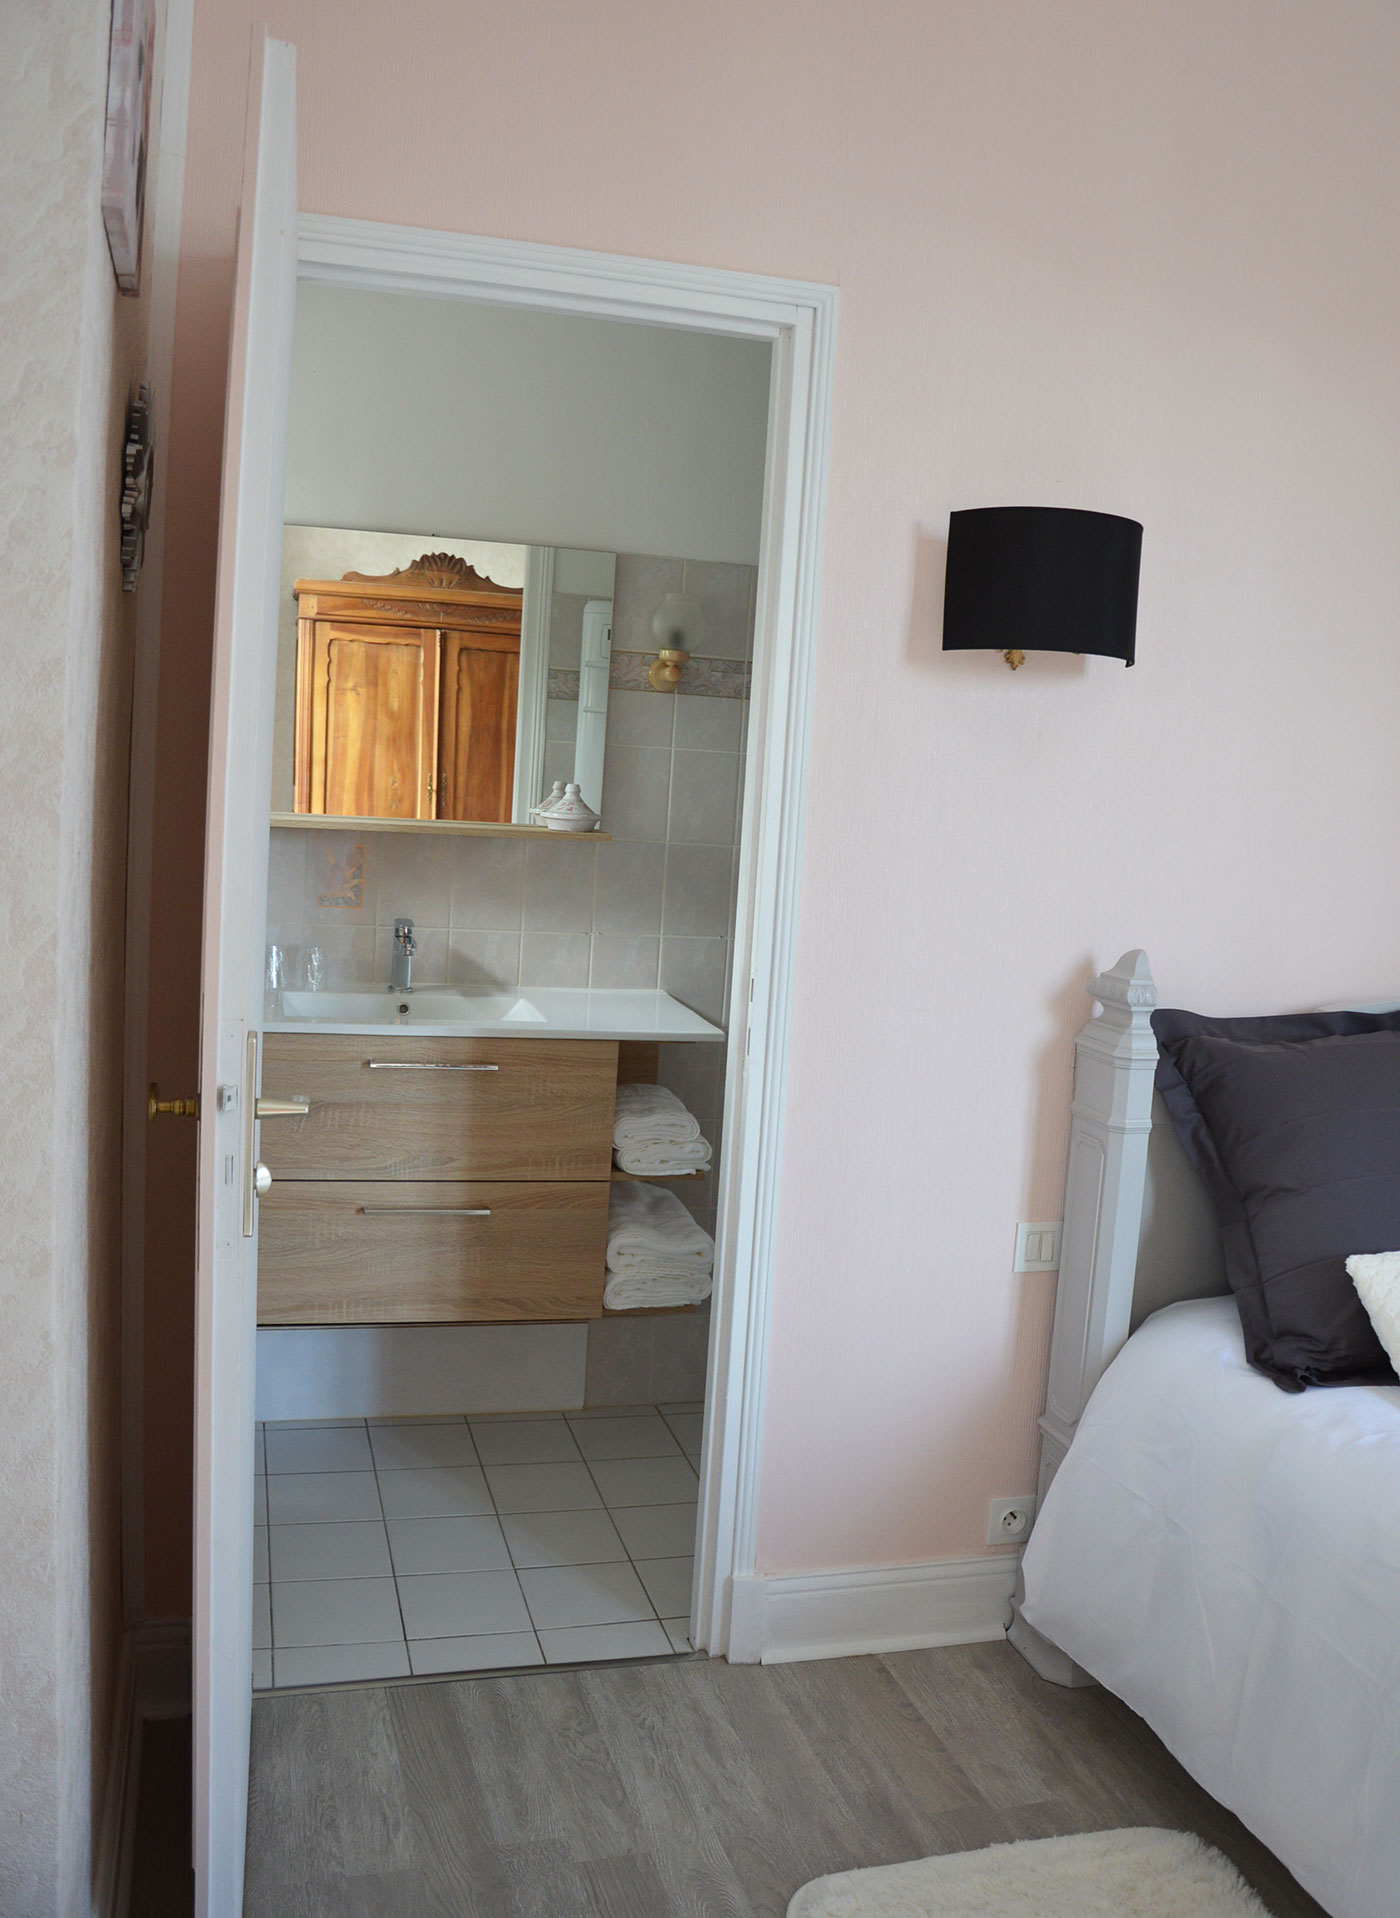 Bathroom Petite Champagne room